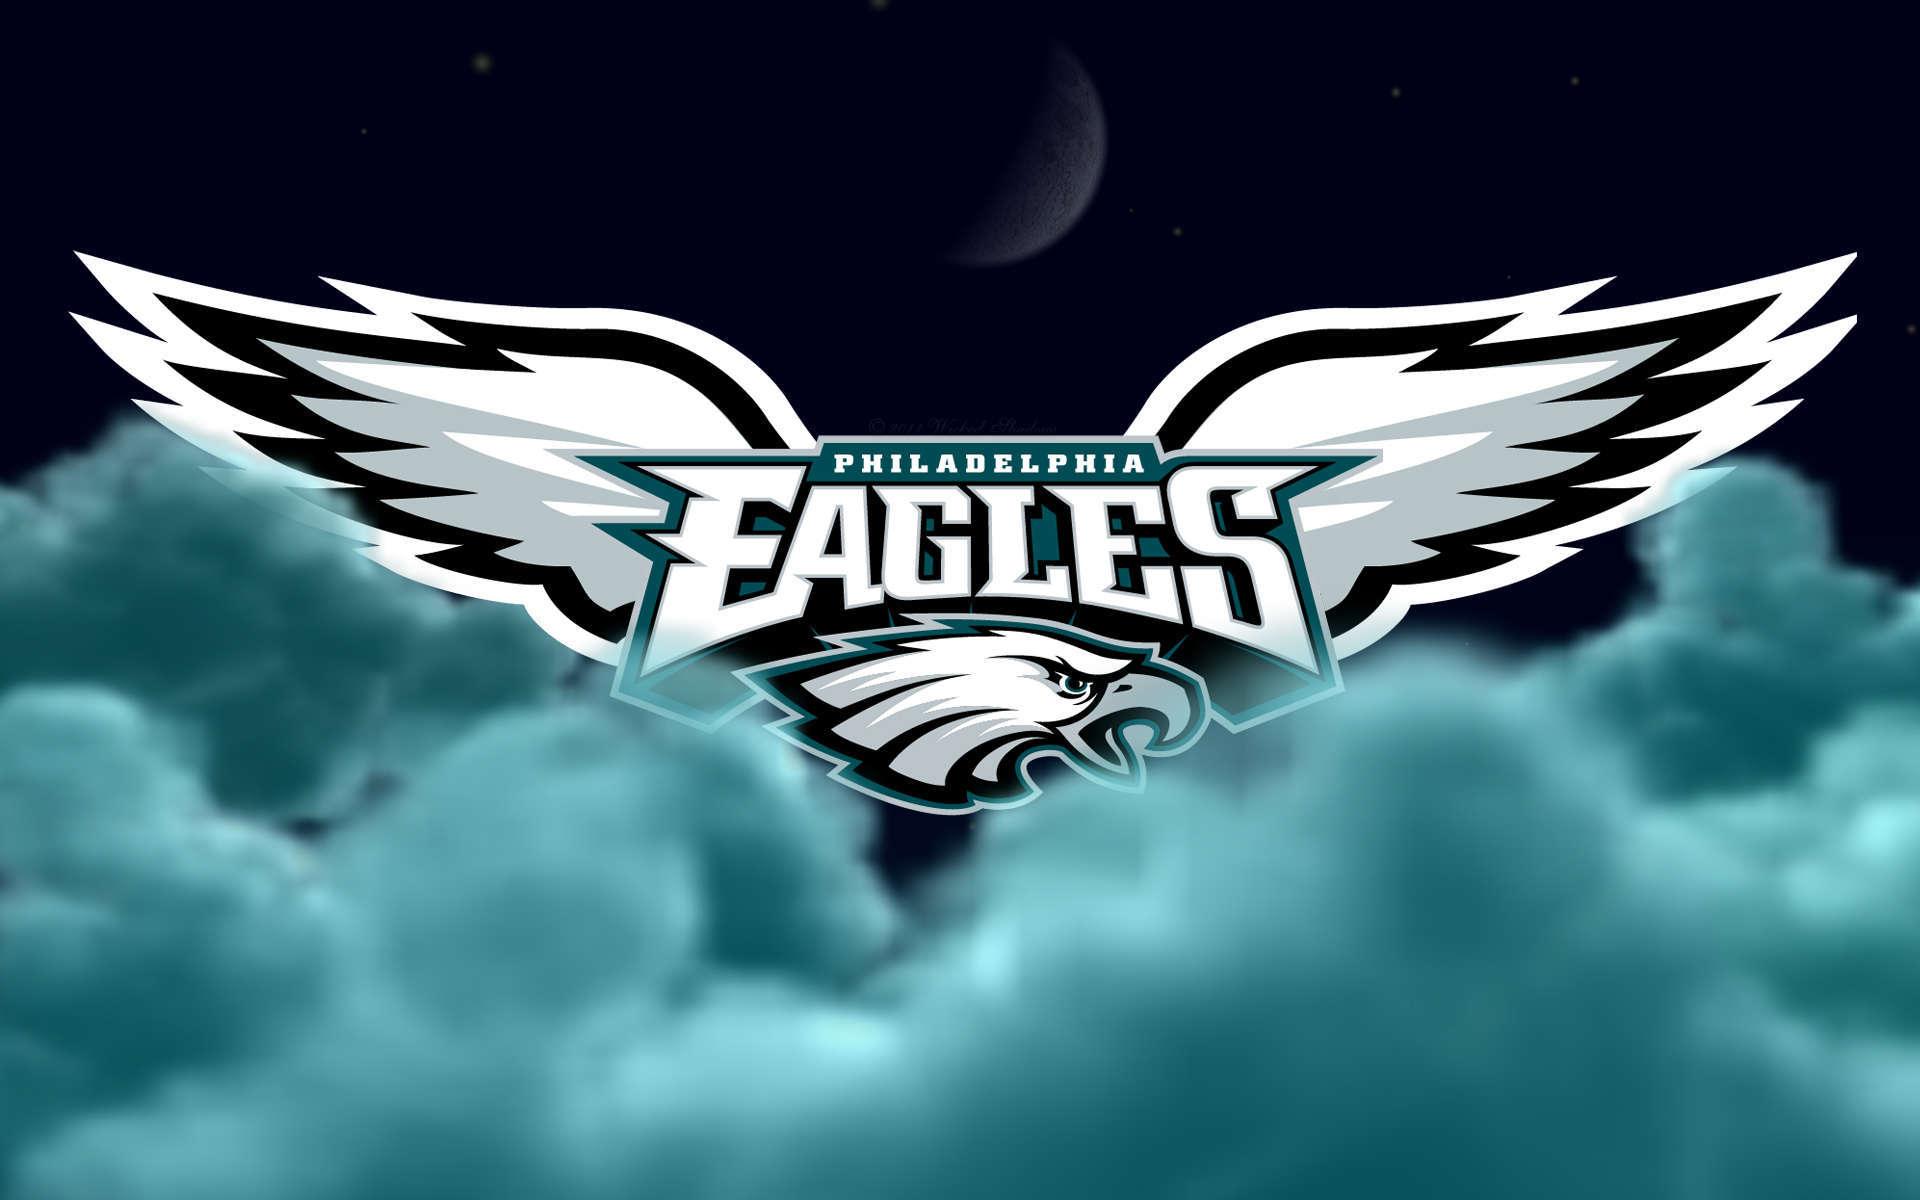 Philadelphia Eagles Logo NFL Wallpaper HD image and save image as 1920x1200